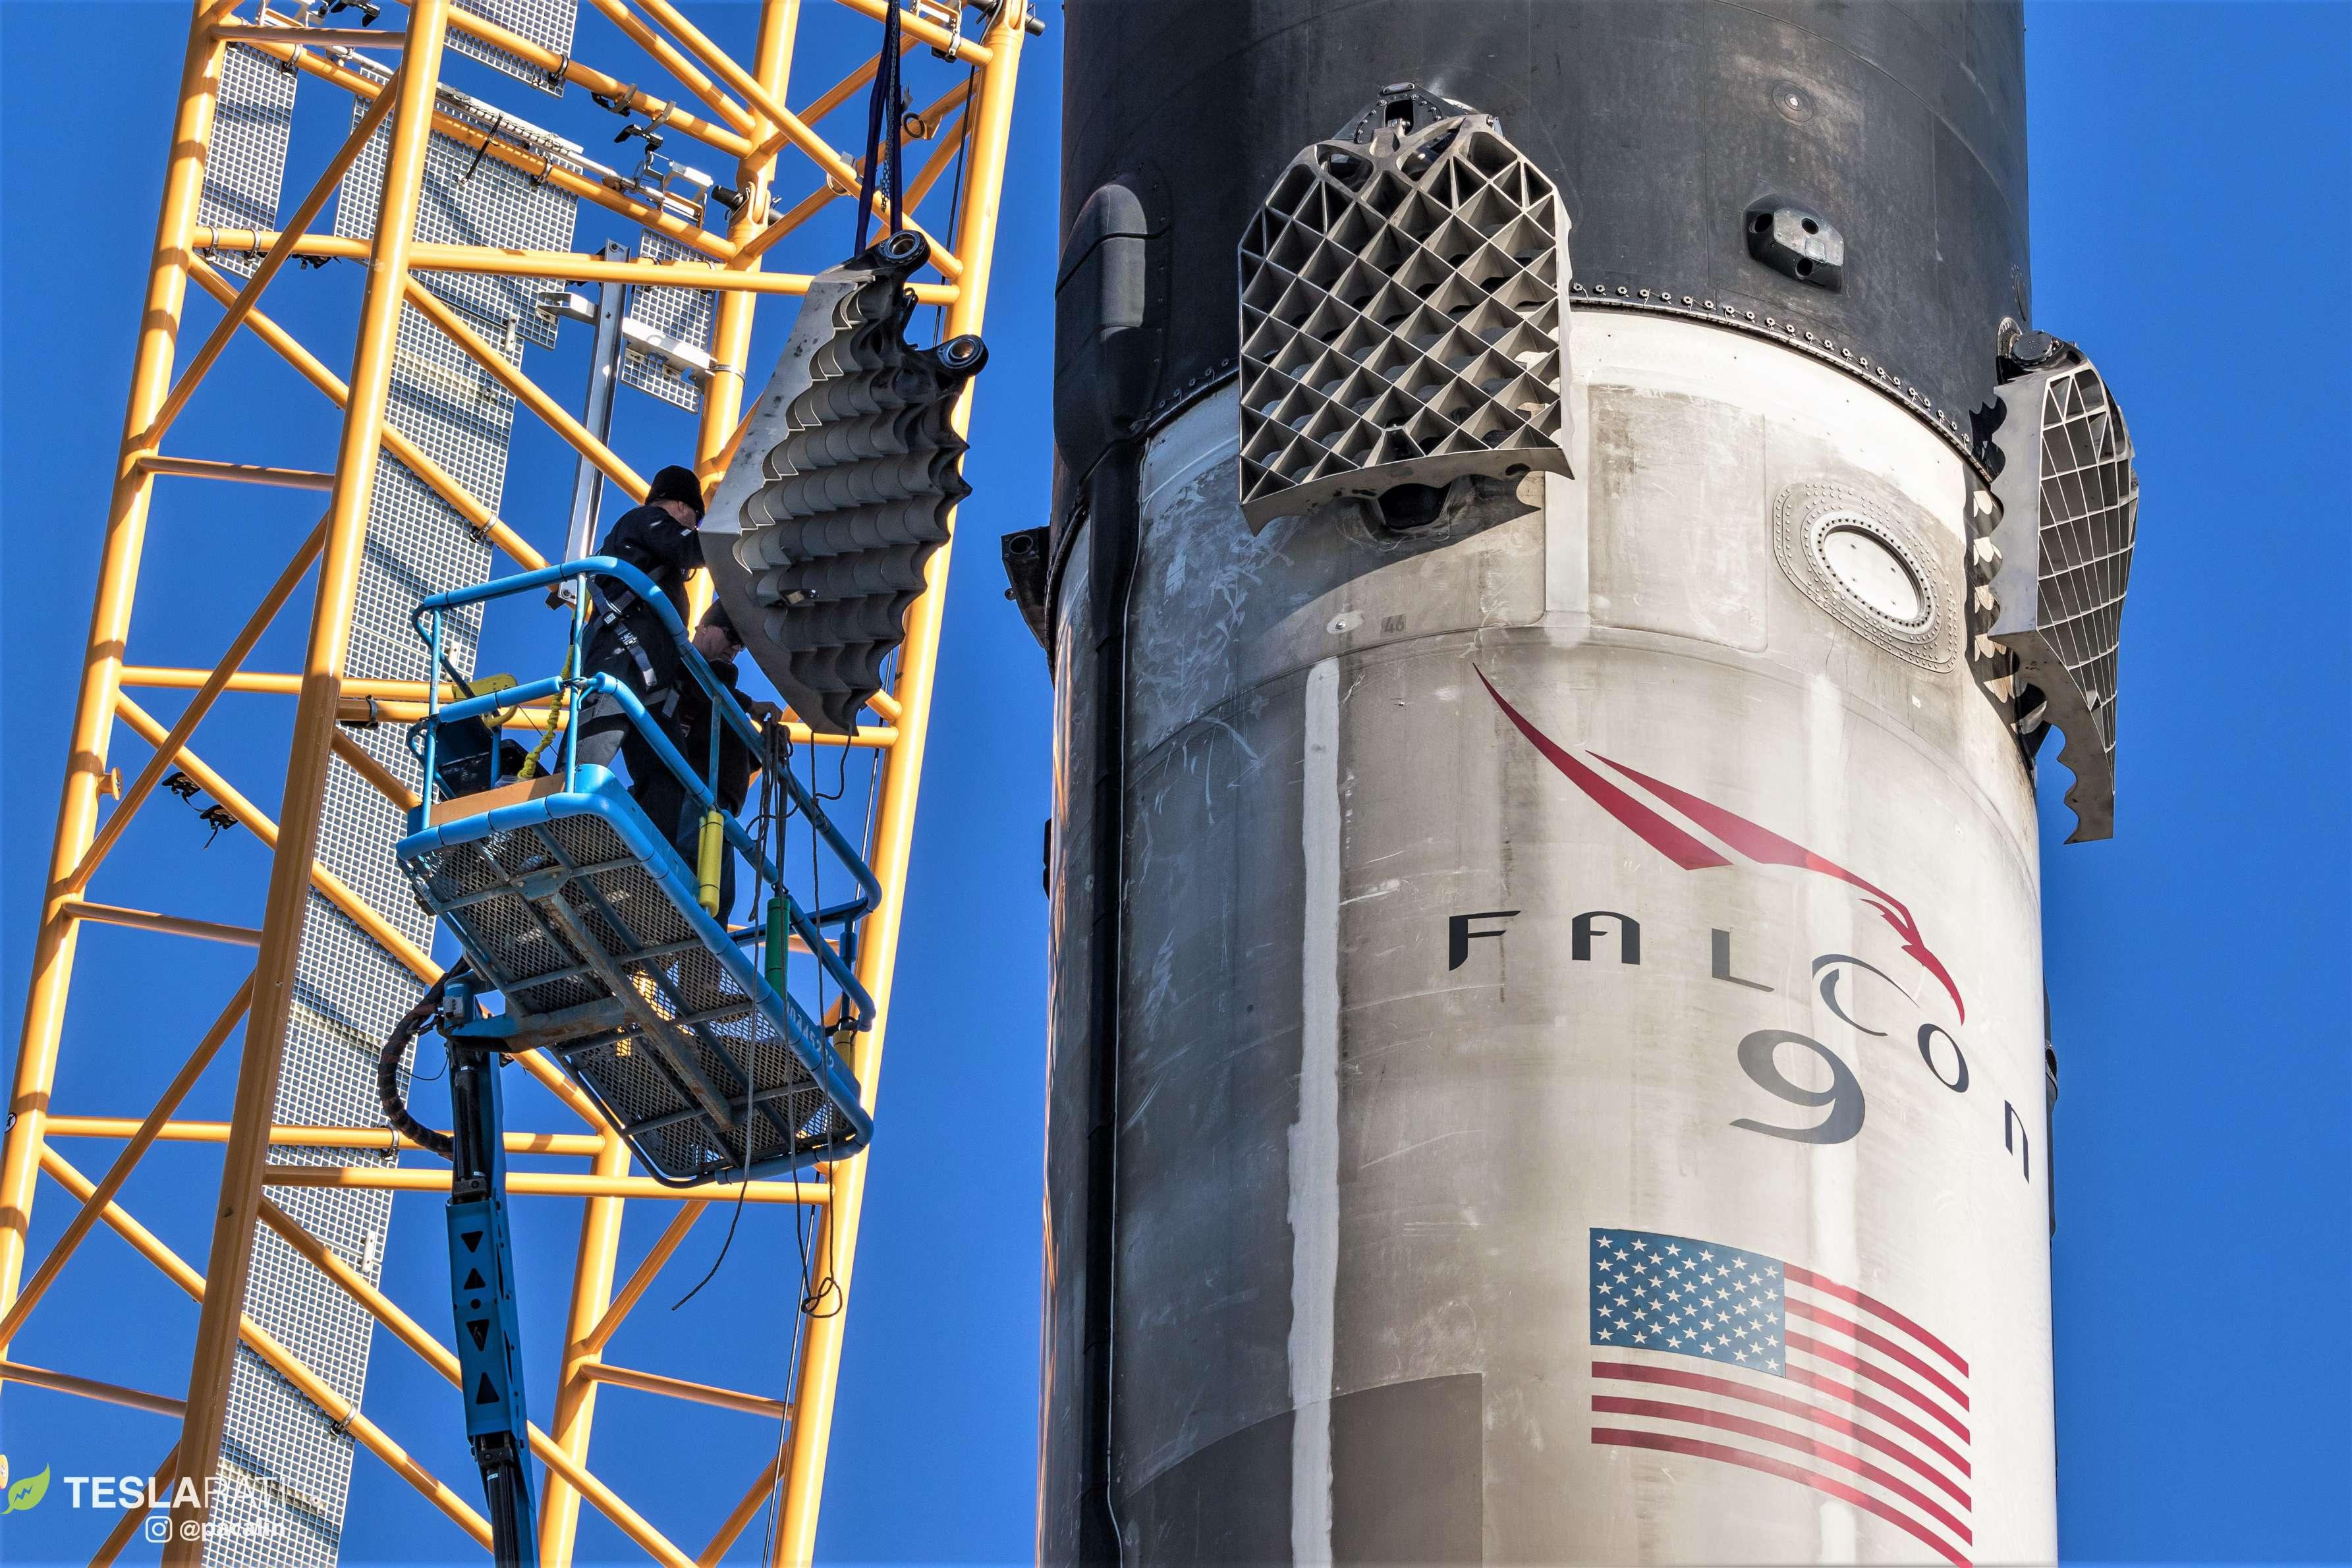 Falcon 9 B1046 SSO-A grid fin removal 120818 (Pauline Acalin) (33)(c)